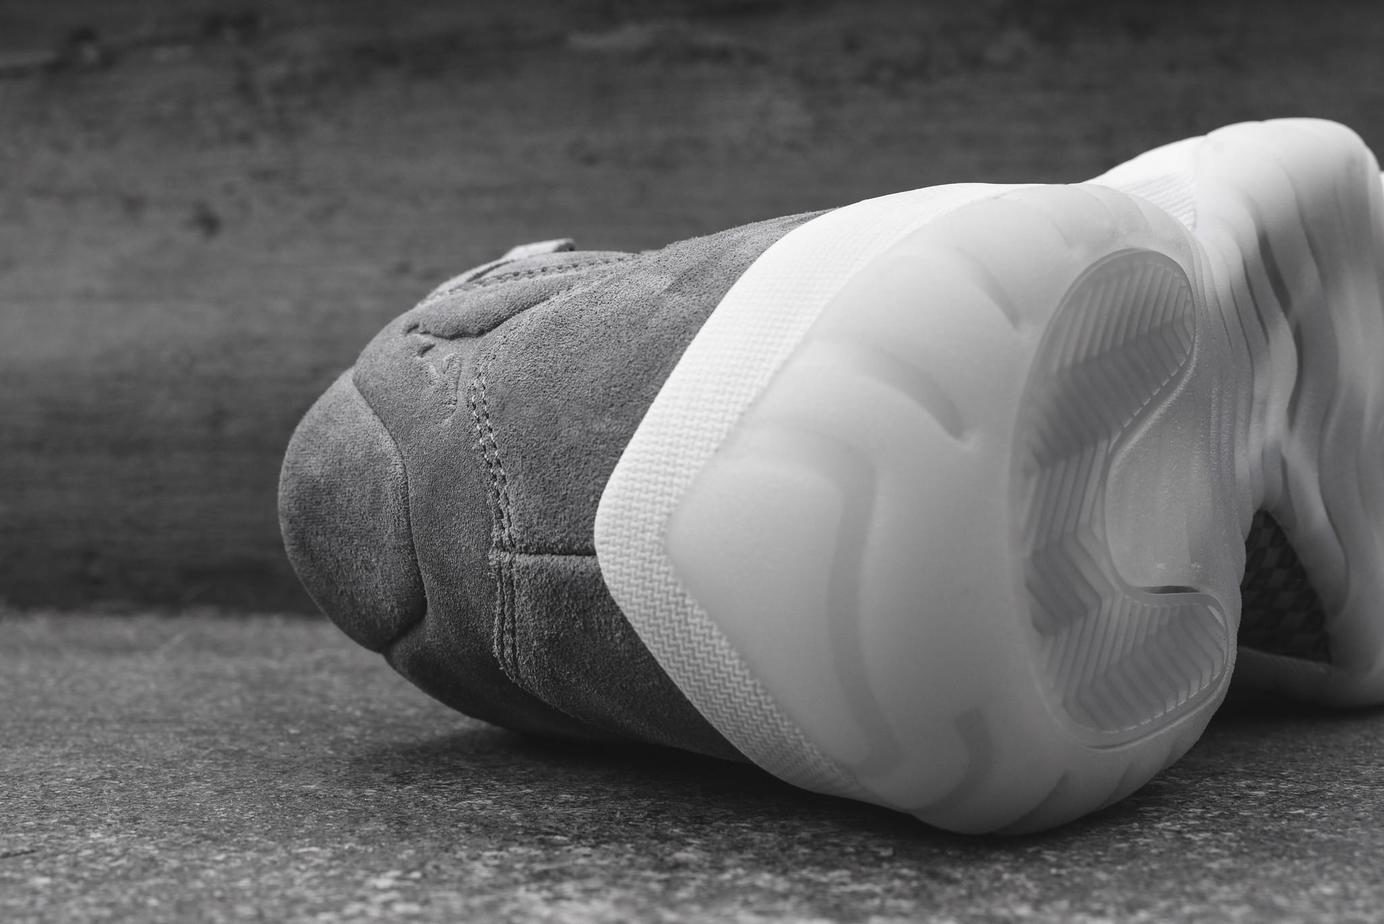 Air Jordan 11 Pinnacle Grey Suede Now Available - JustFreshKicks e6aba3c8a